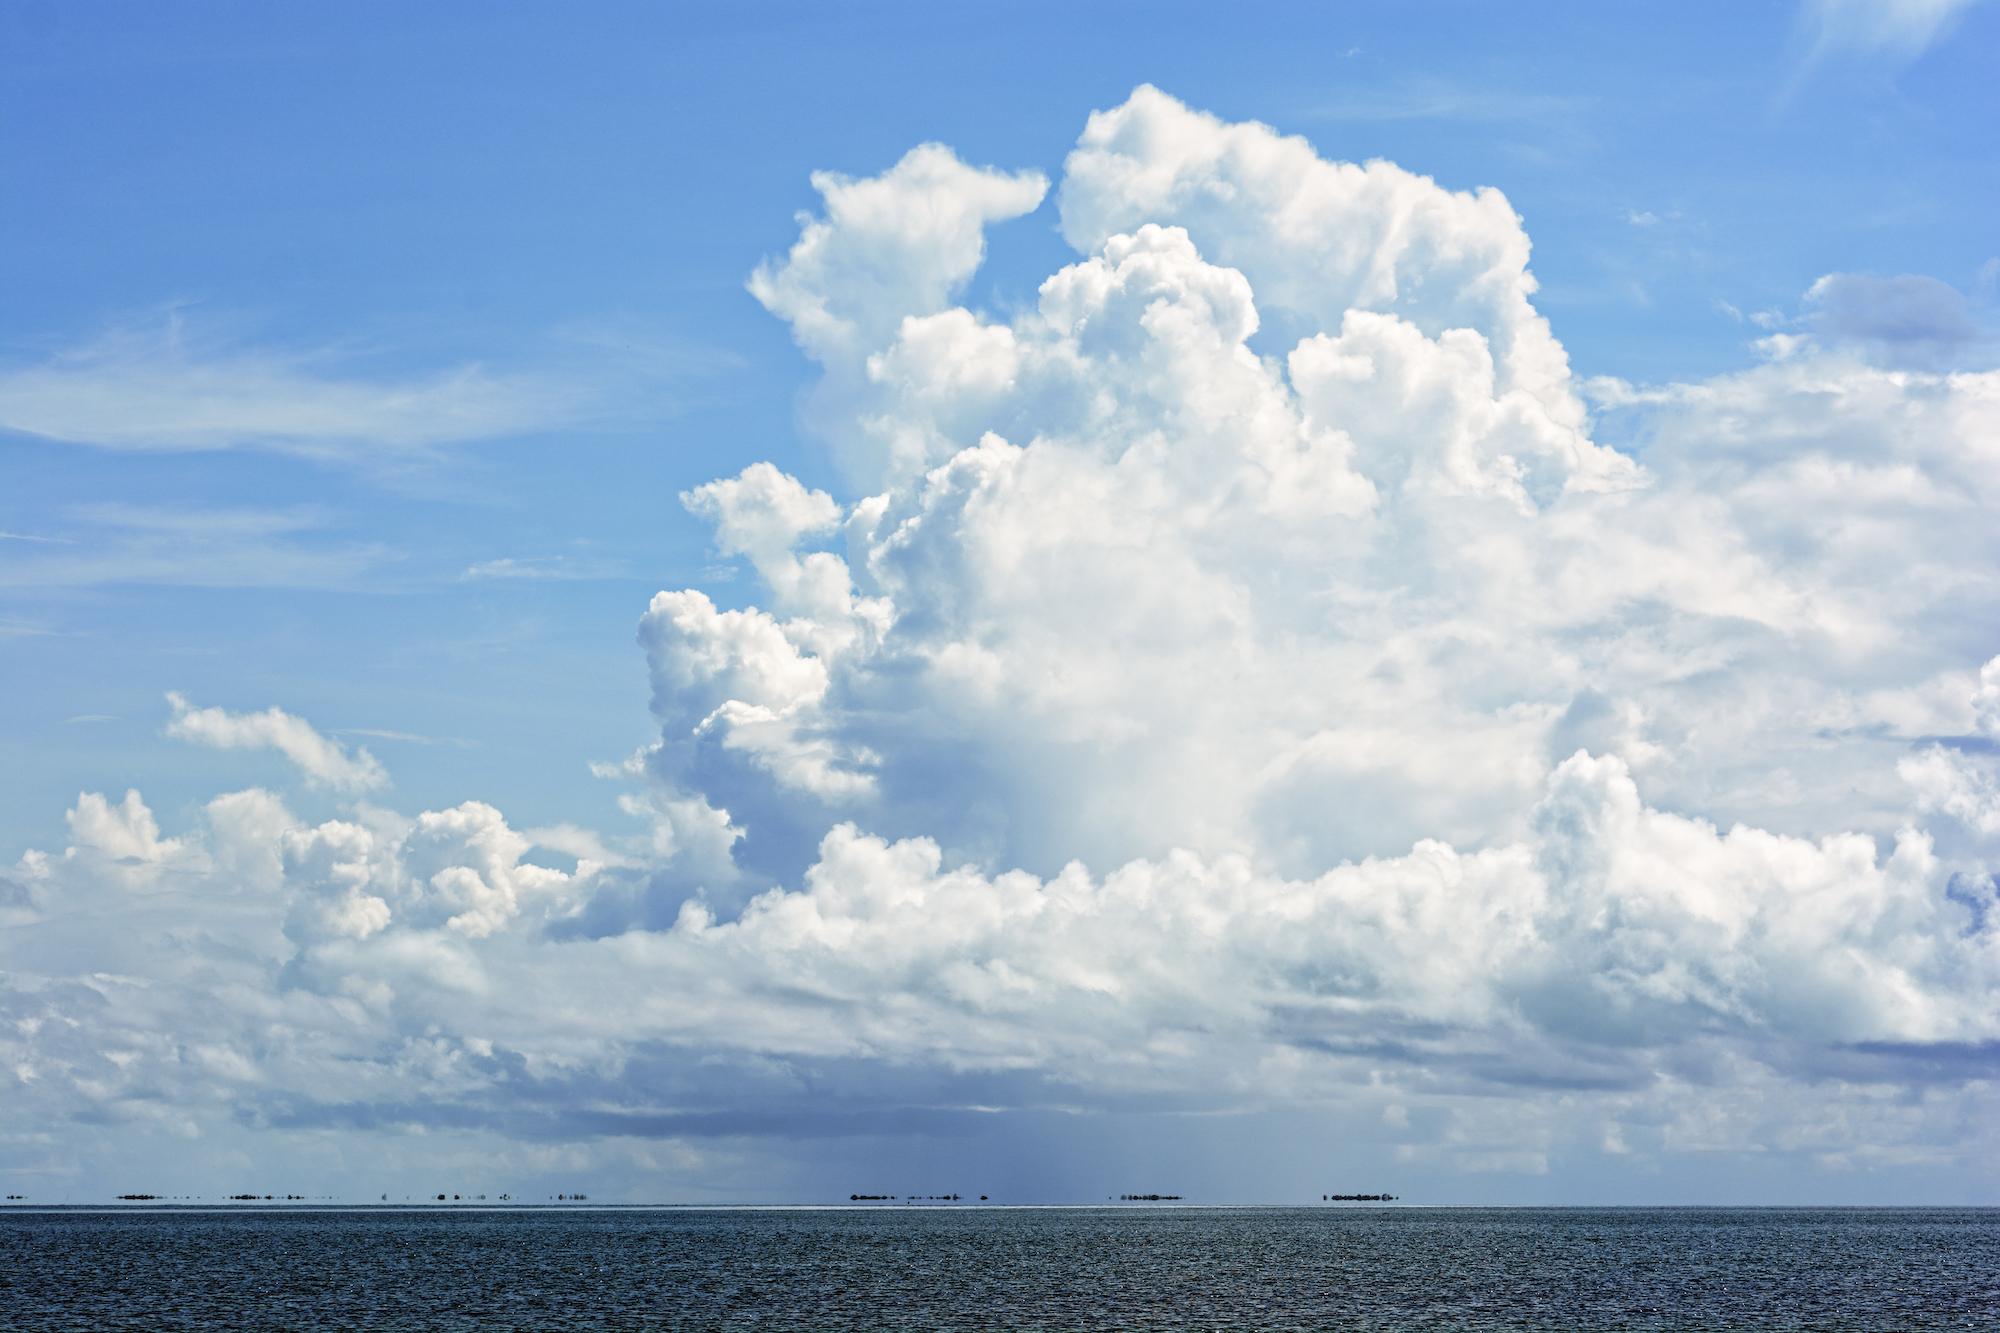 Big white clouds over the sea